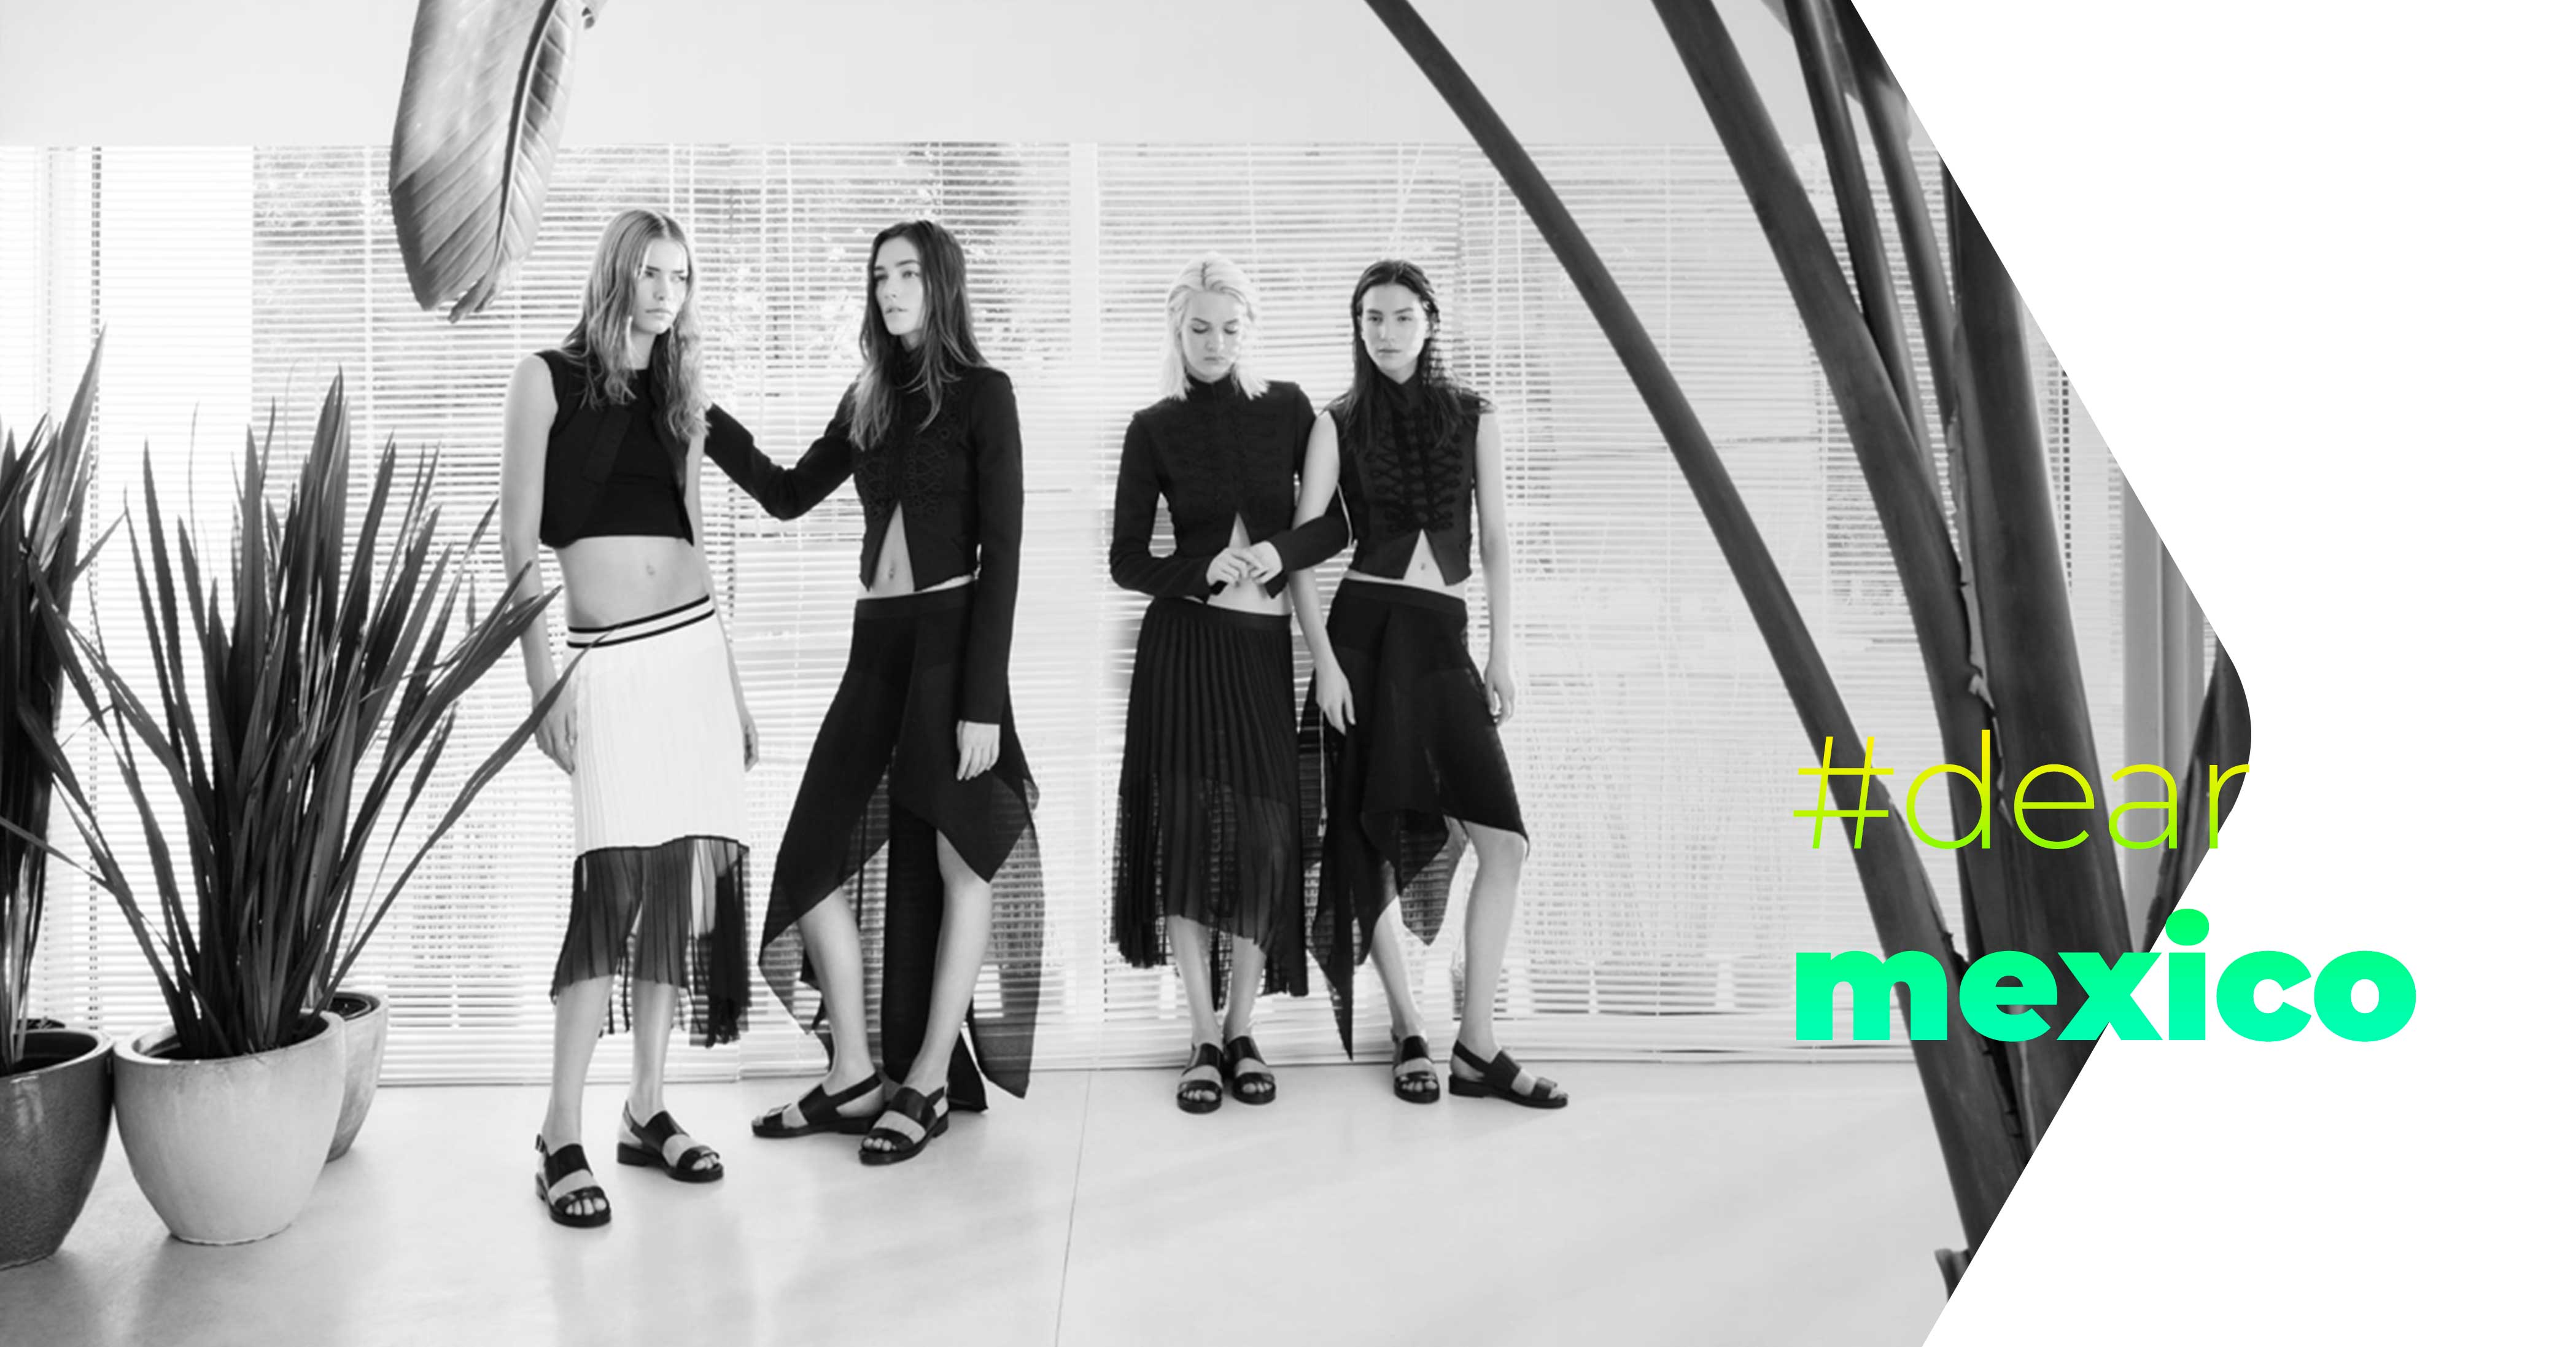 Makken - Zara lanzamiento e-commerce